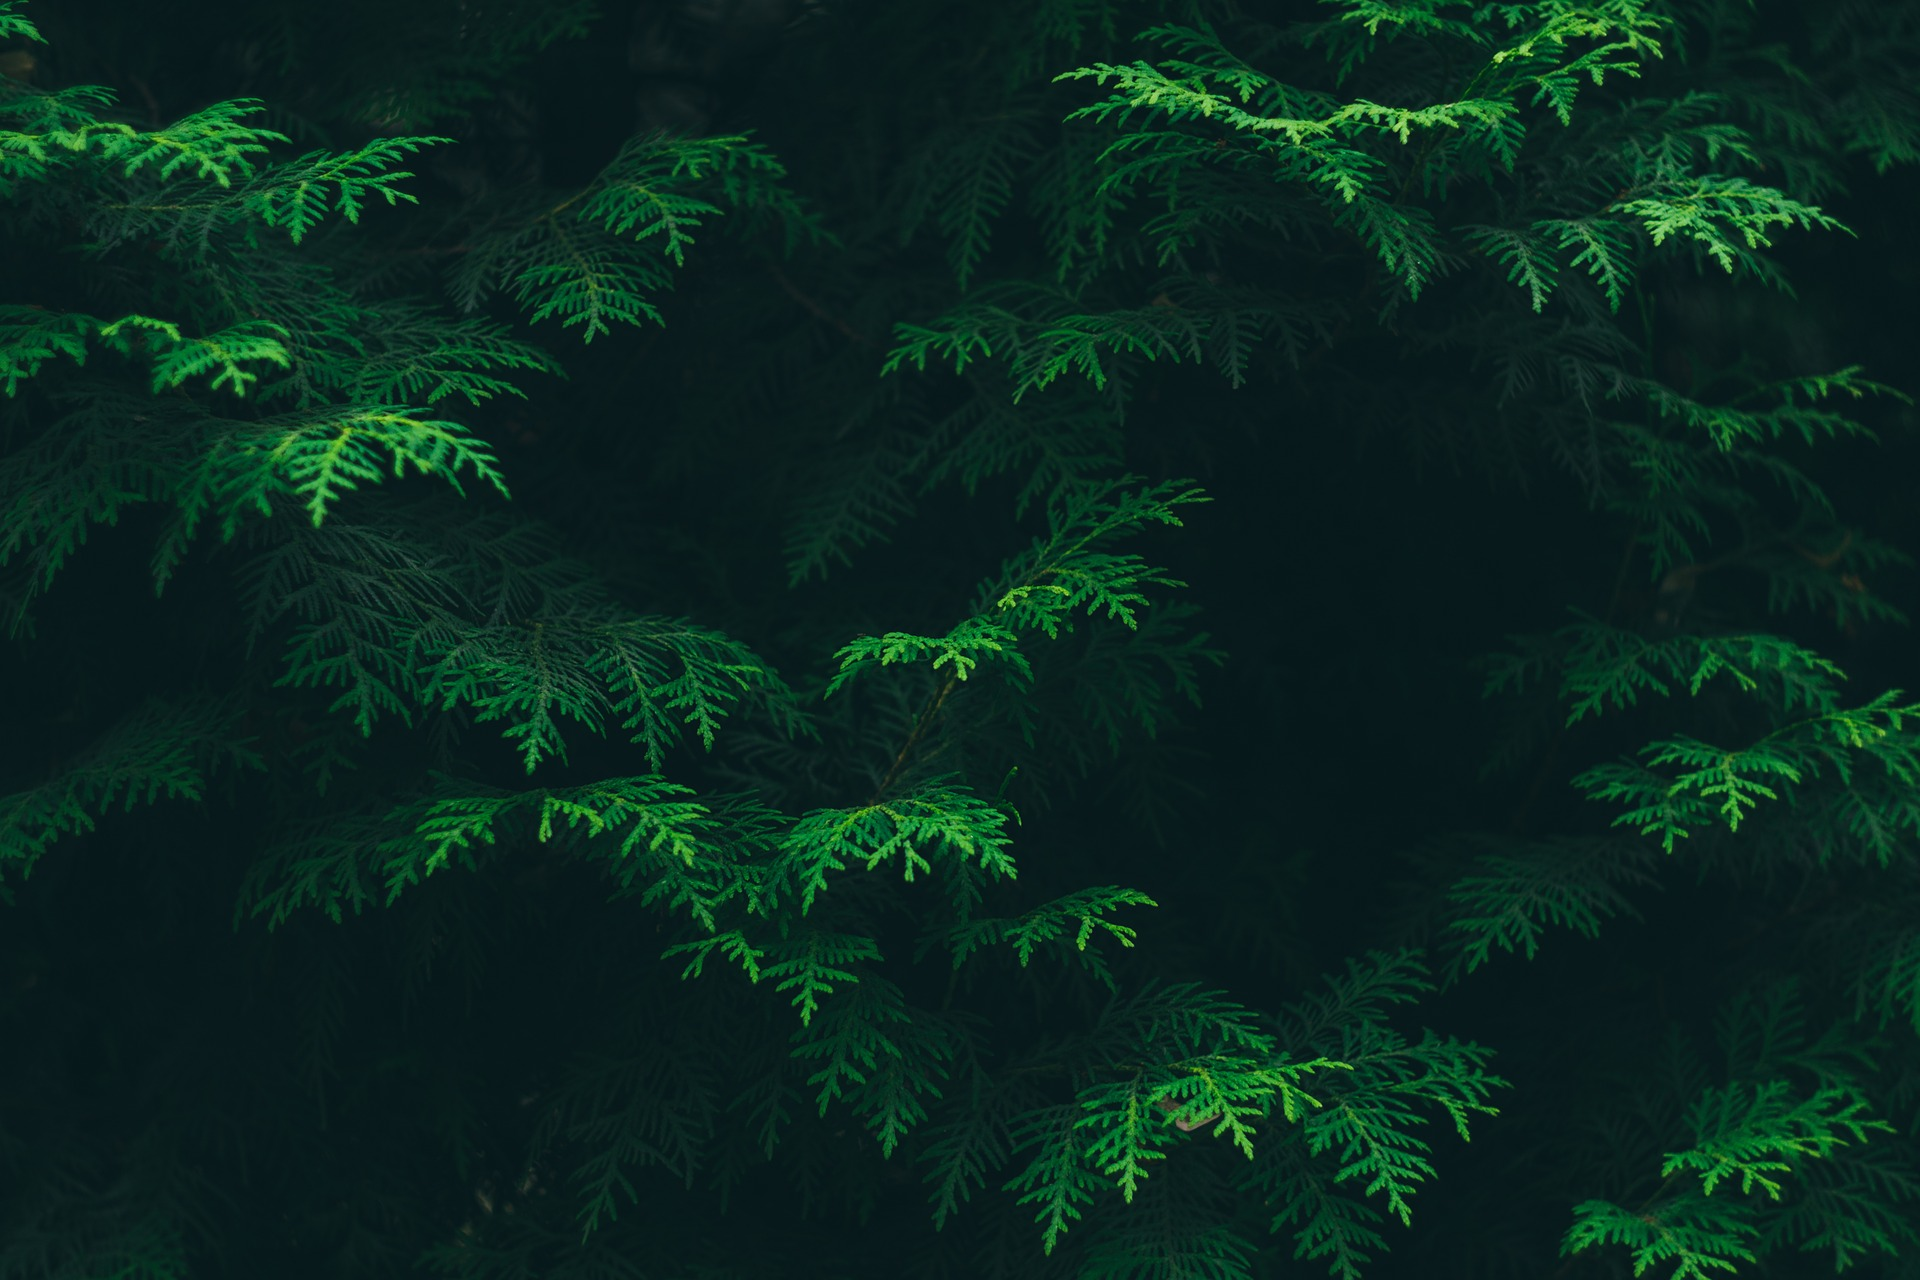 conifer-1867371_1920.jpg